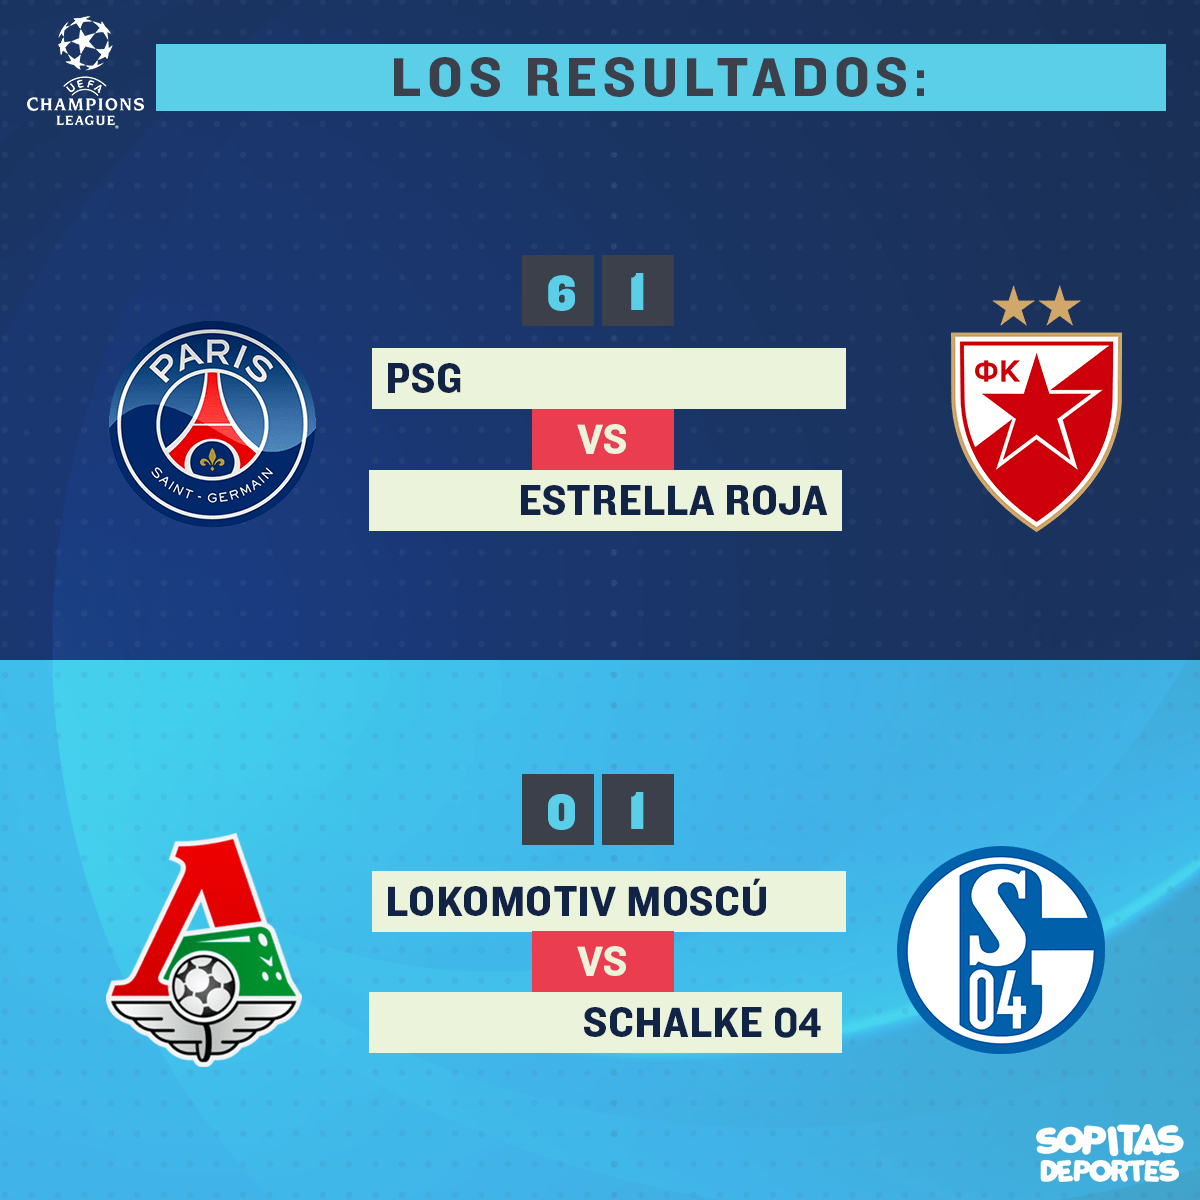 PSG aplastó al Estrella Roja y Schalke derrotó al Lokomotiv